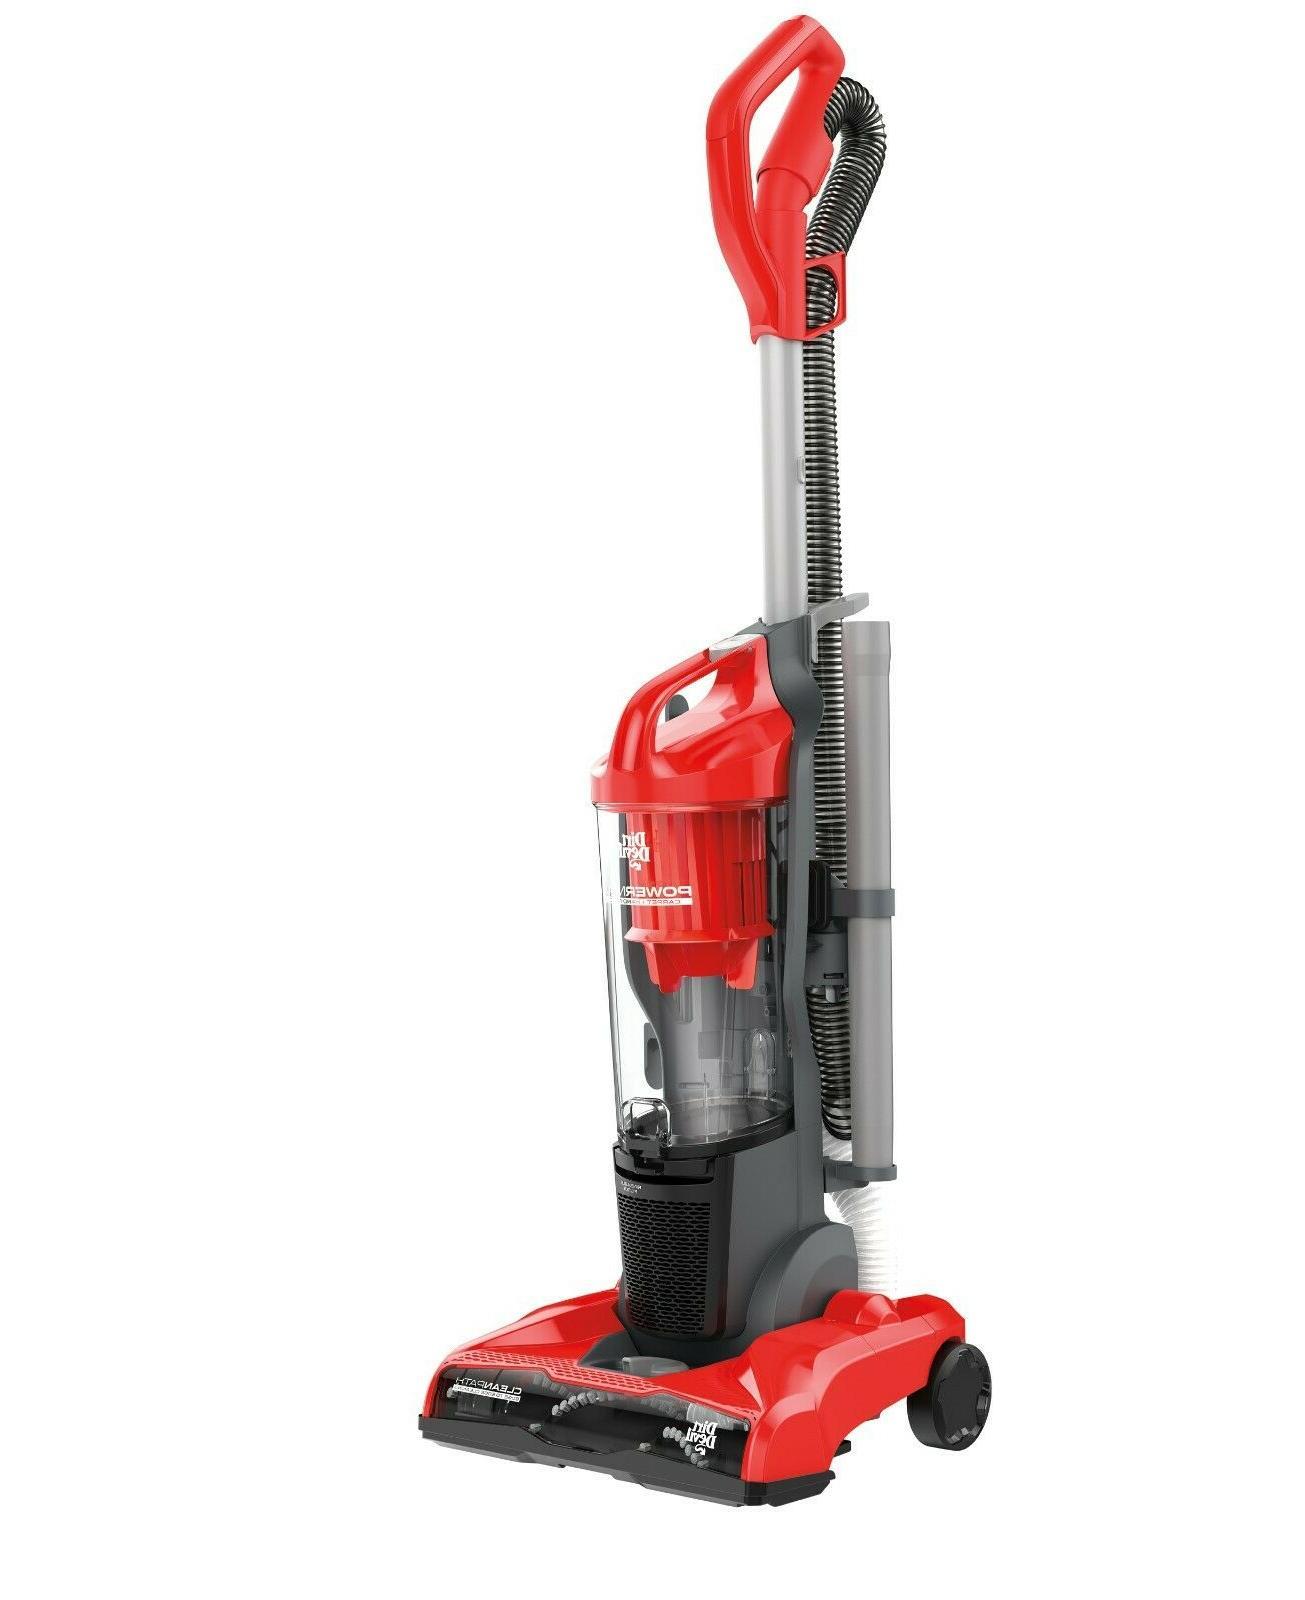 Dirt Devil Bagless Upright Vacuum sweeper hand floor